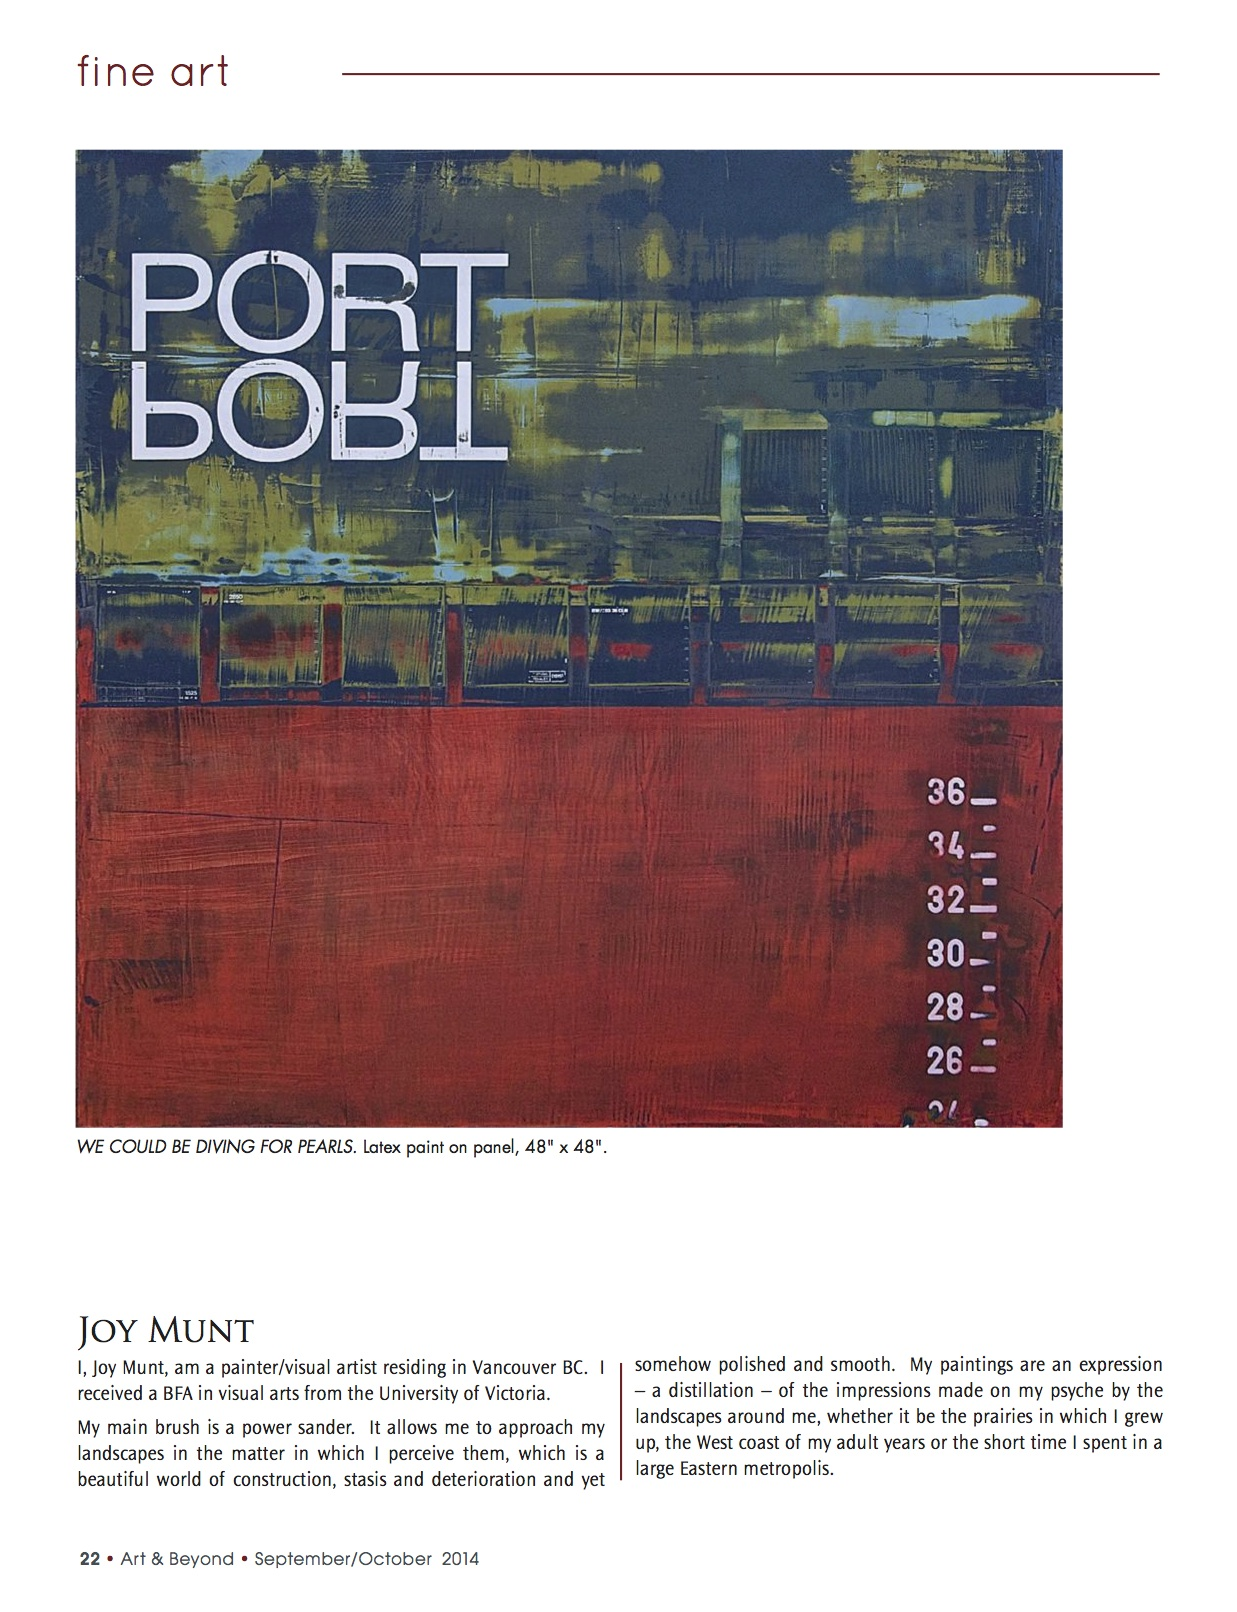 Other_Publications_Art_Beyond_September_October_Online_2014.jpg